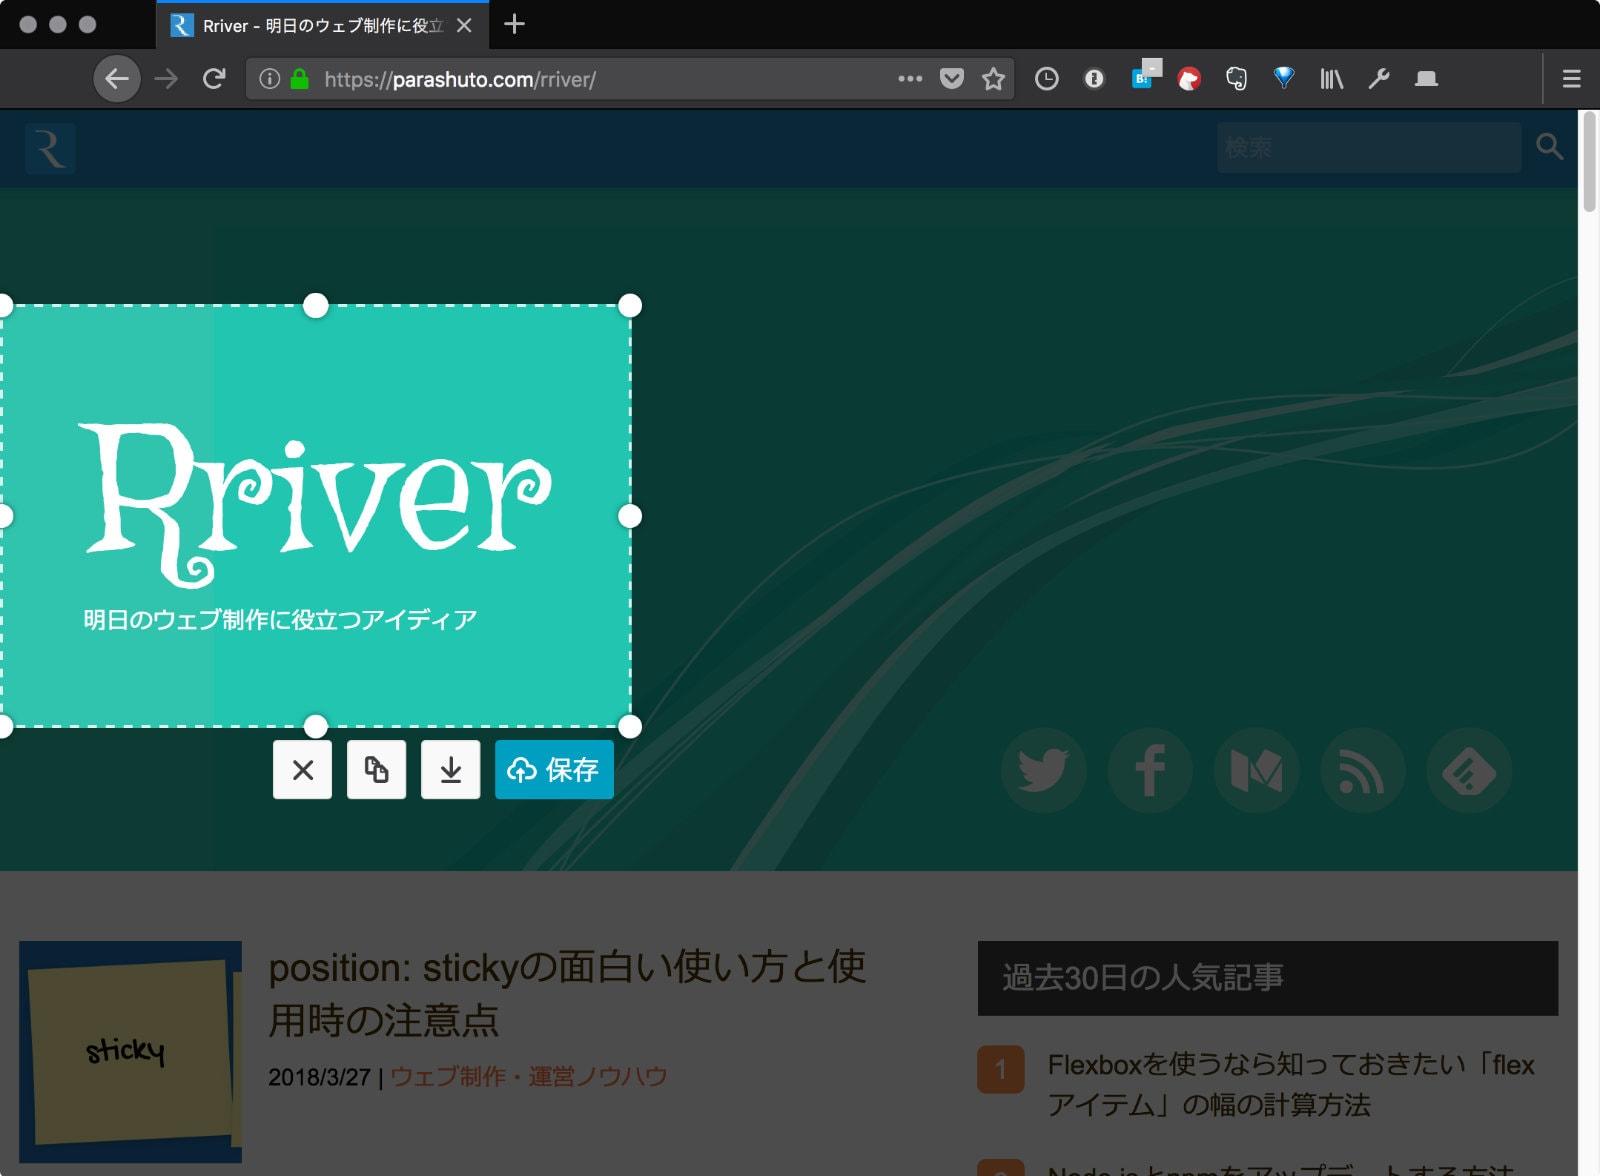 Firefox Screenshotsでページの一部の範囲を選択してスクショを撮る画面